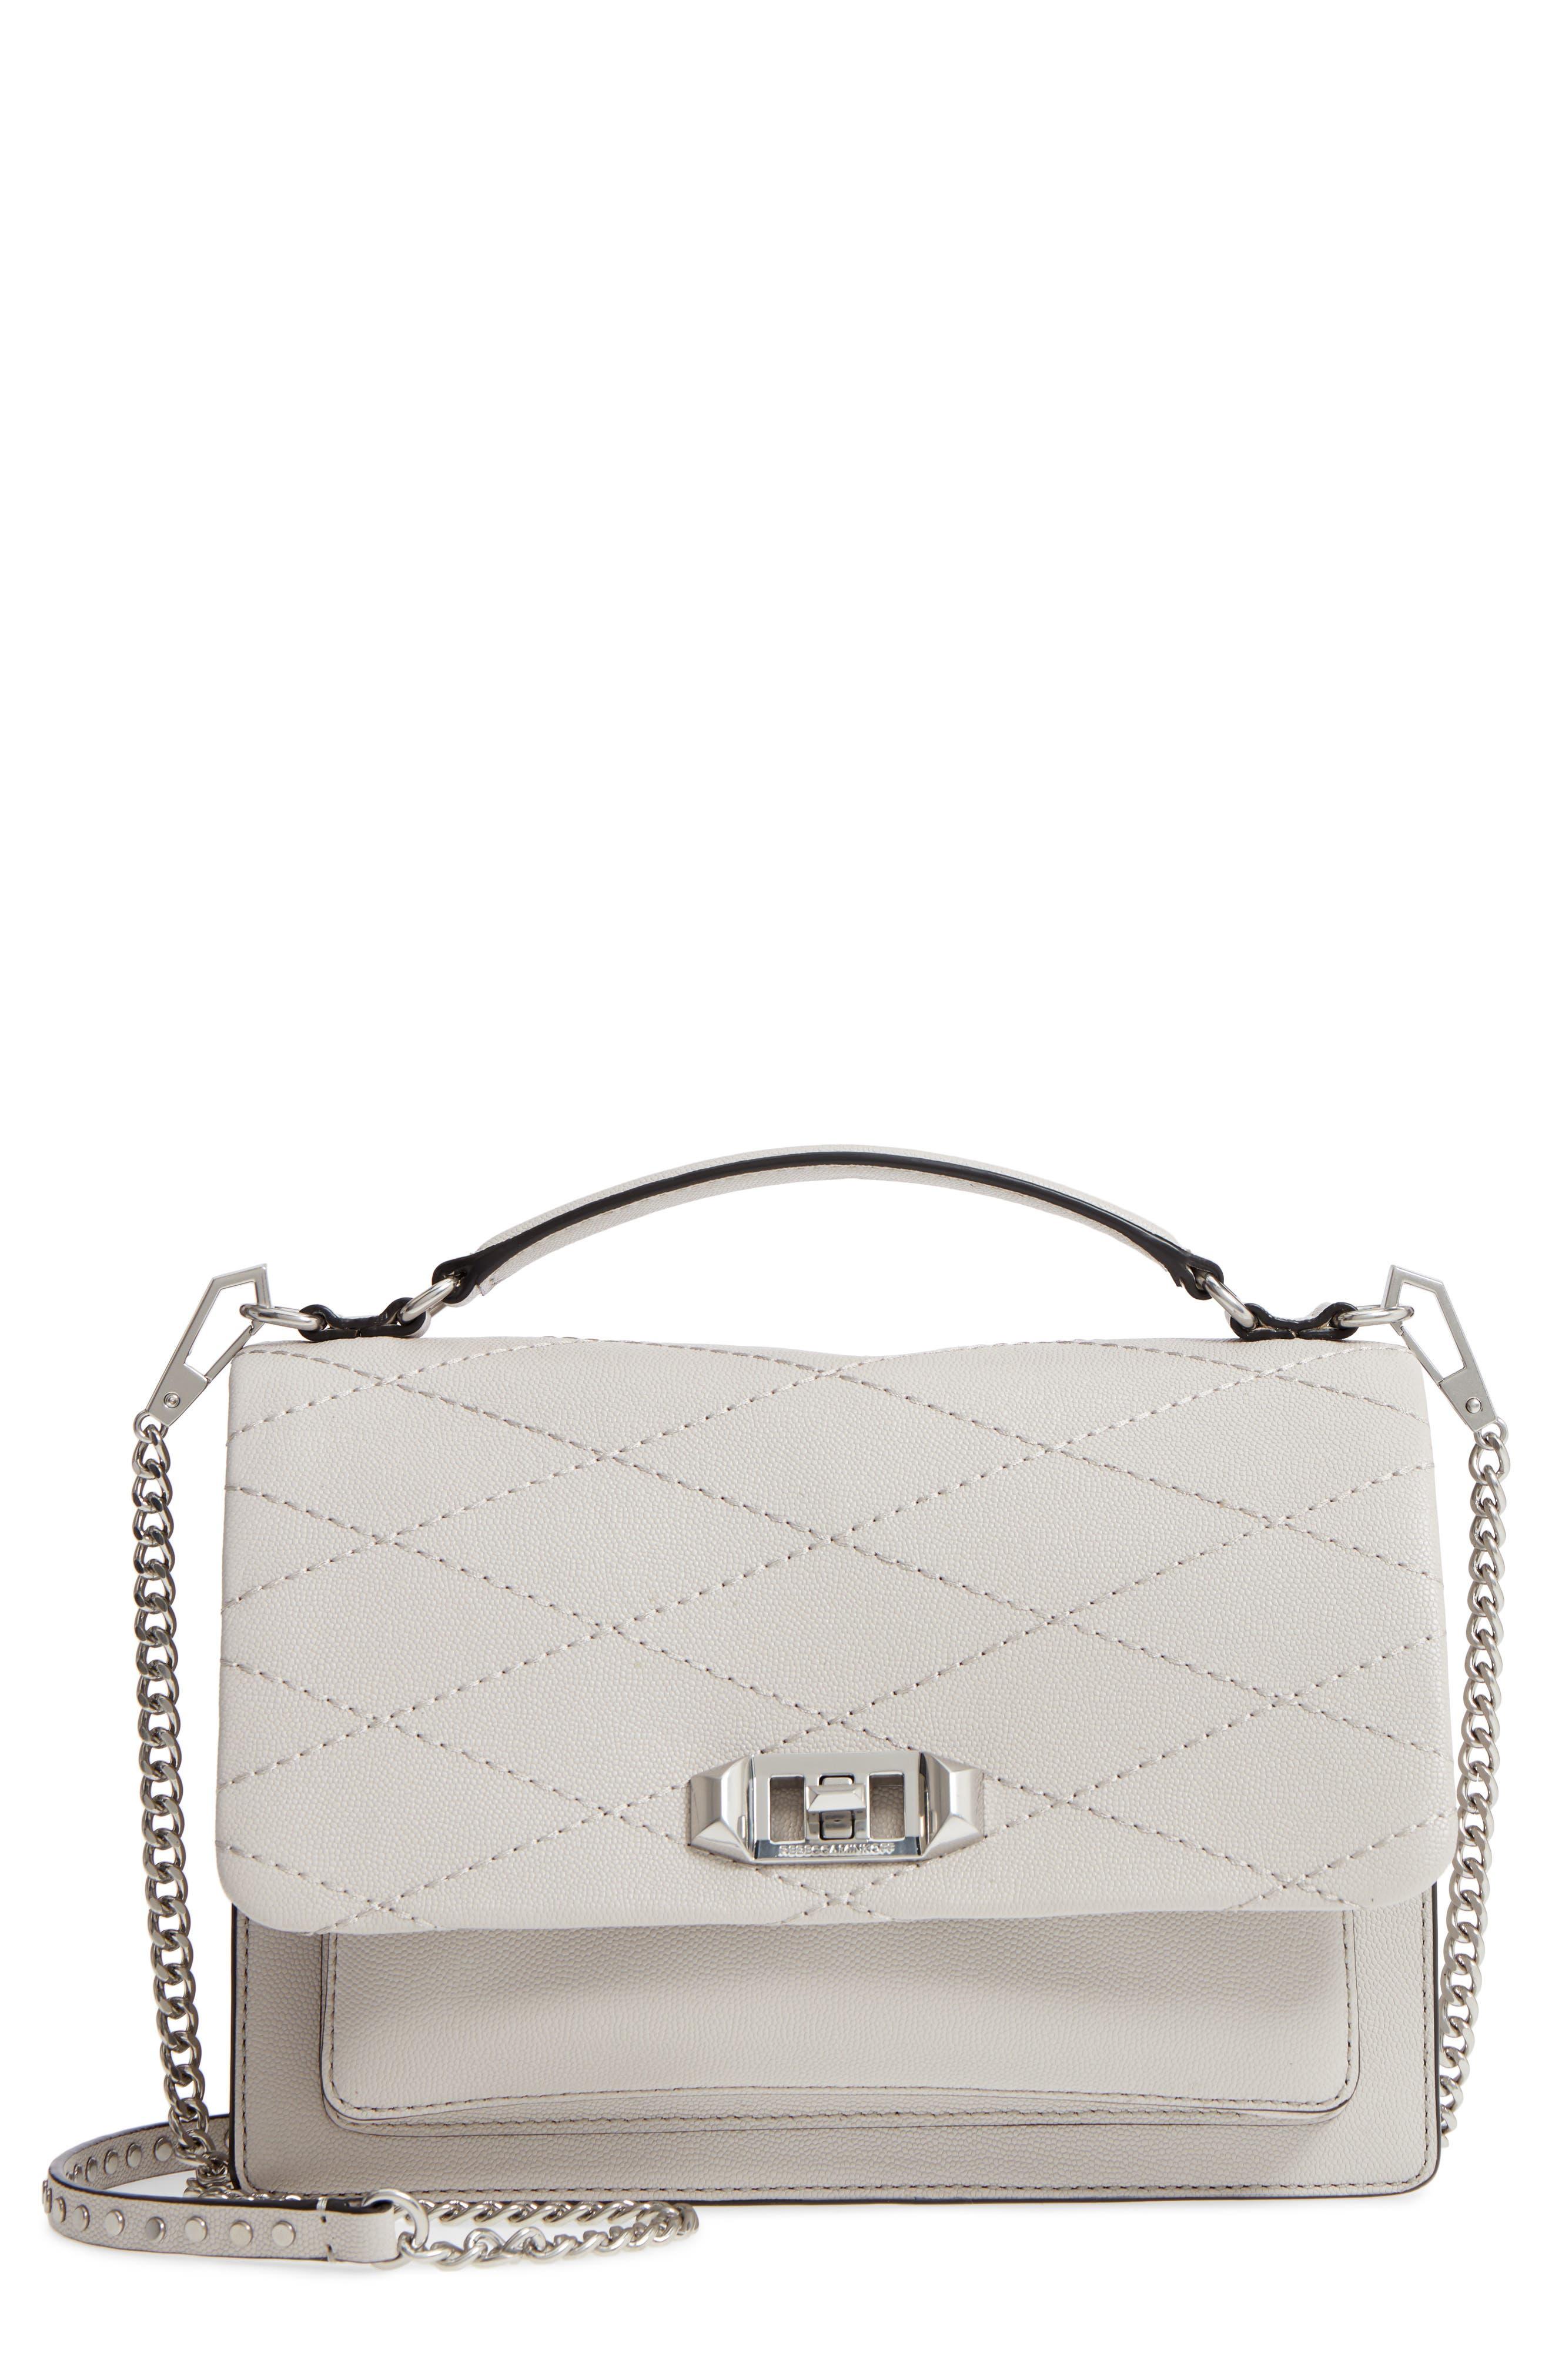 Medium Je T'aime Convertible Leather Crossbody Bag,                             Main thumbnail 10, color,